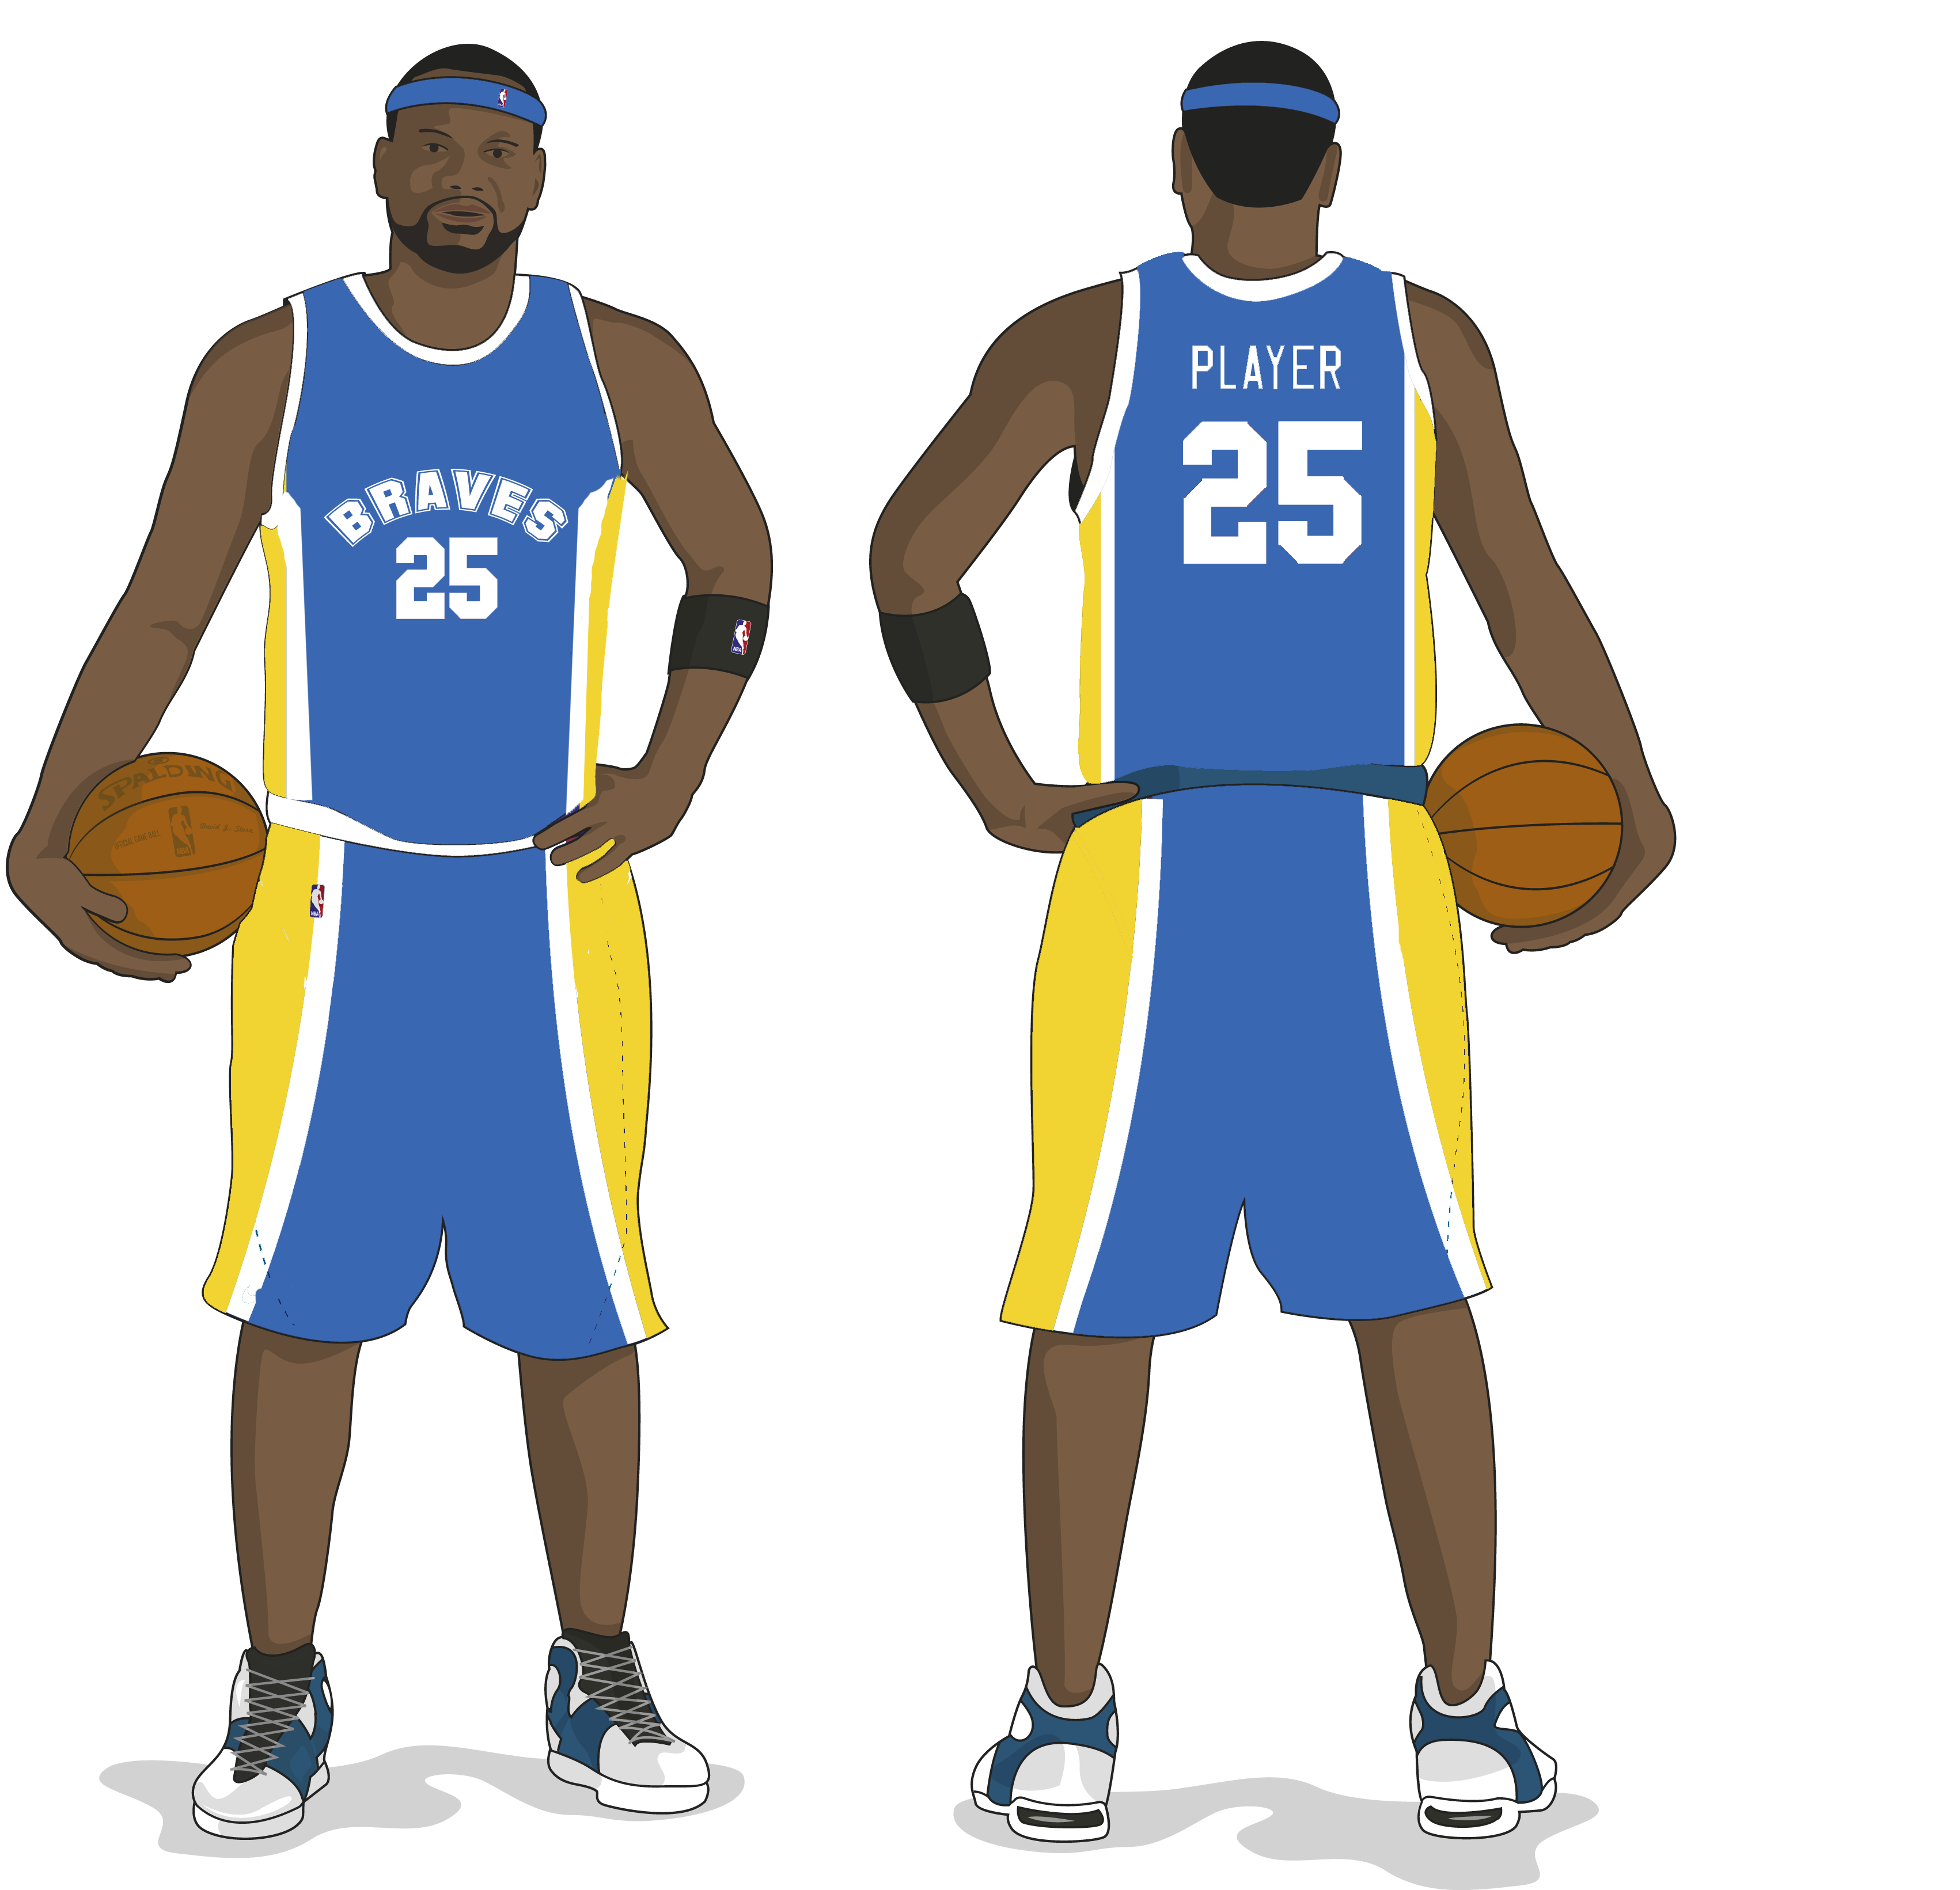 Basketball designs clipart clip art freeuse download Free Basketball Jersey Template, Download Free Clip Art, Free Clip ... clip art freeuse download